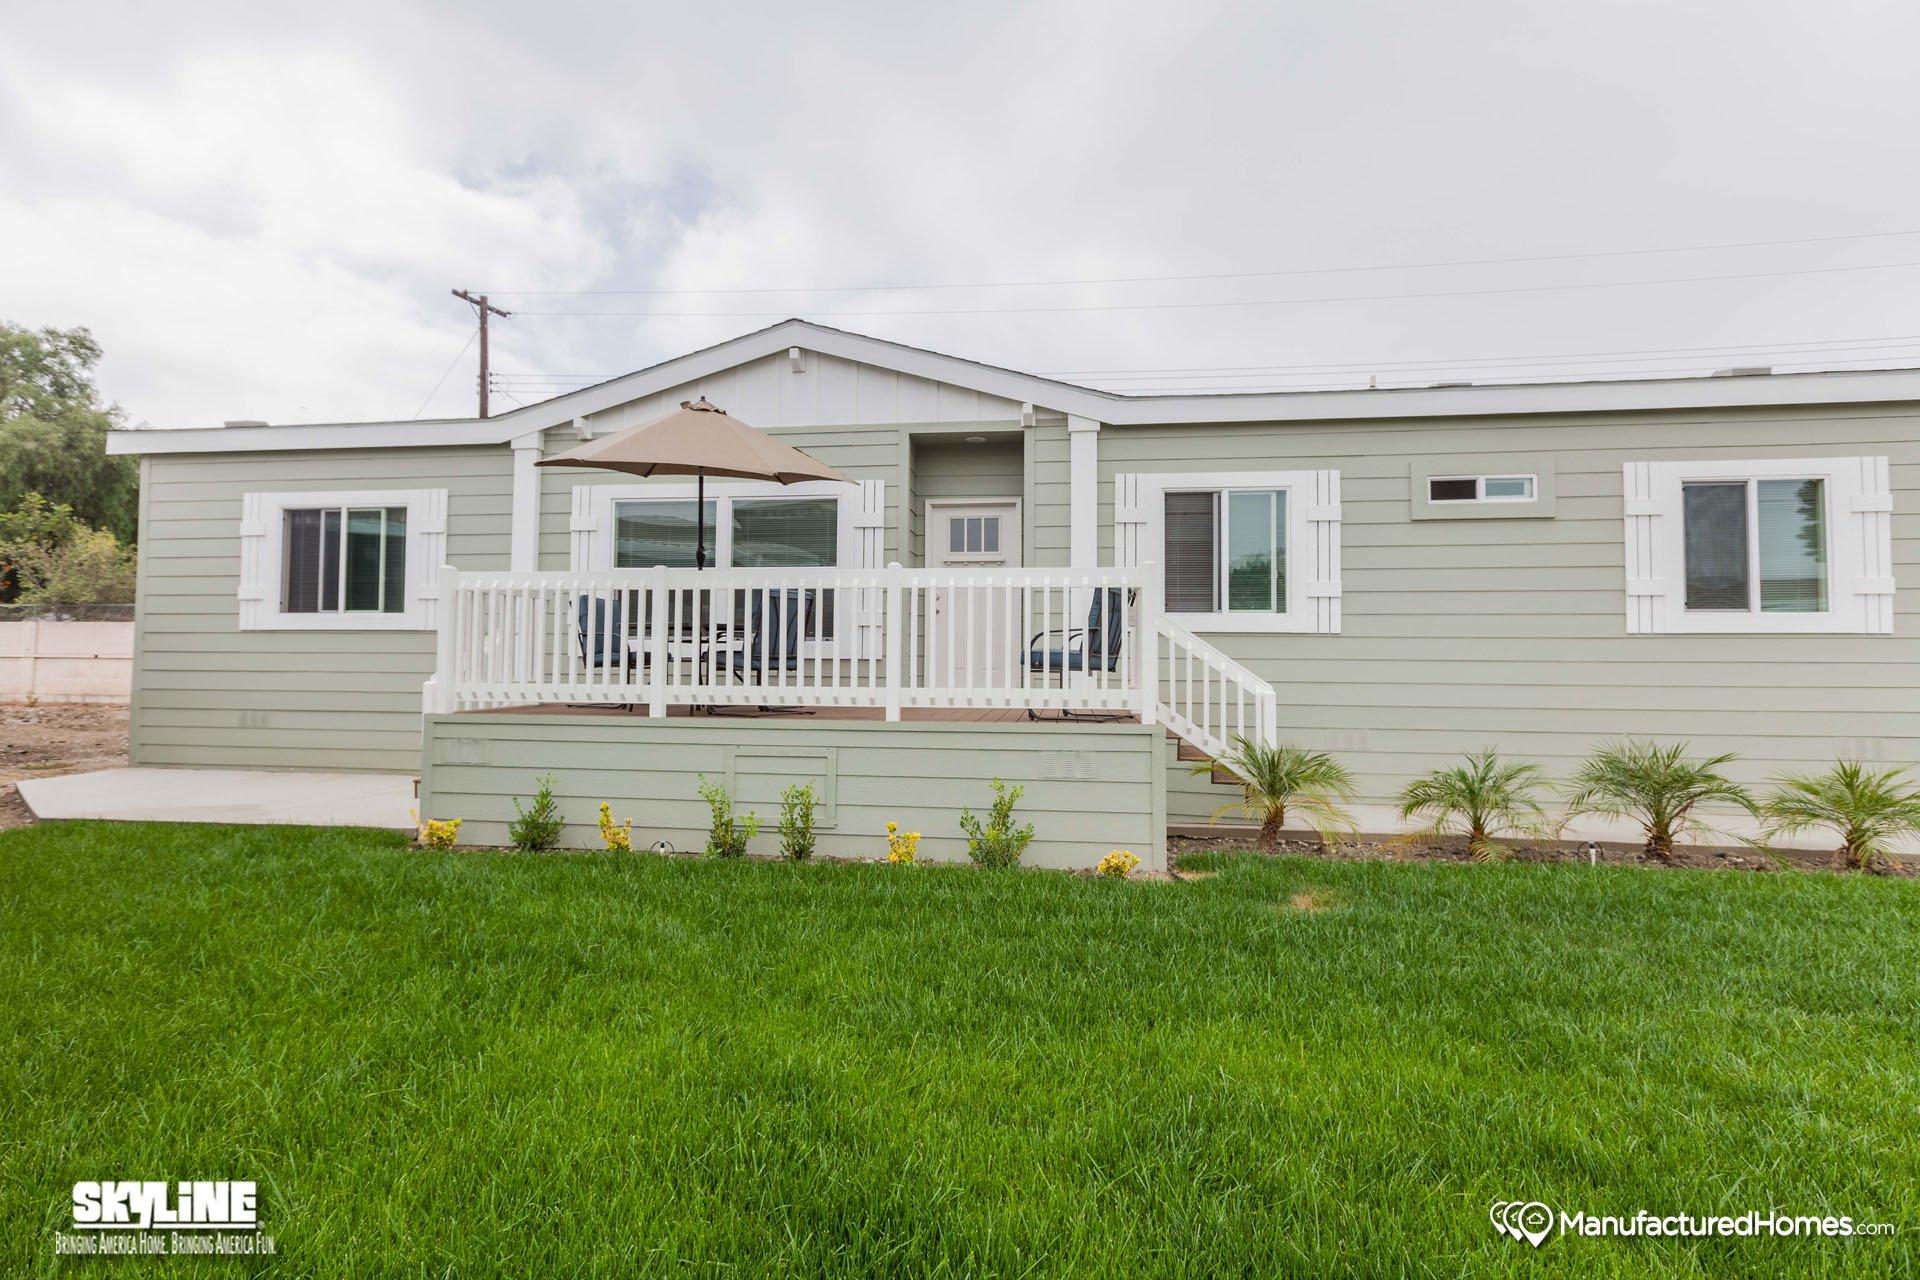 Tumbleweed Homes in Ridgecrest CA Manufactured Home Dealer